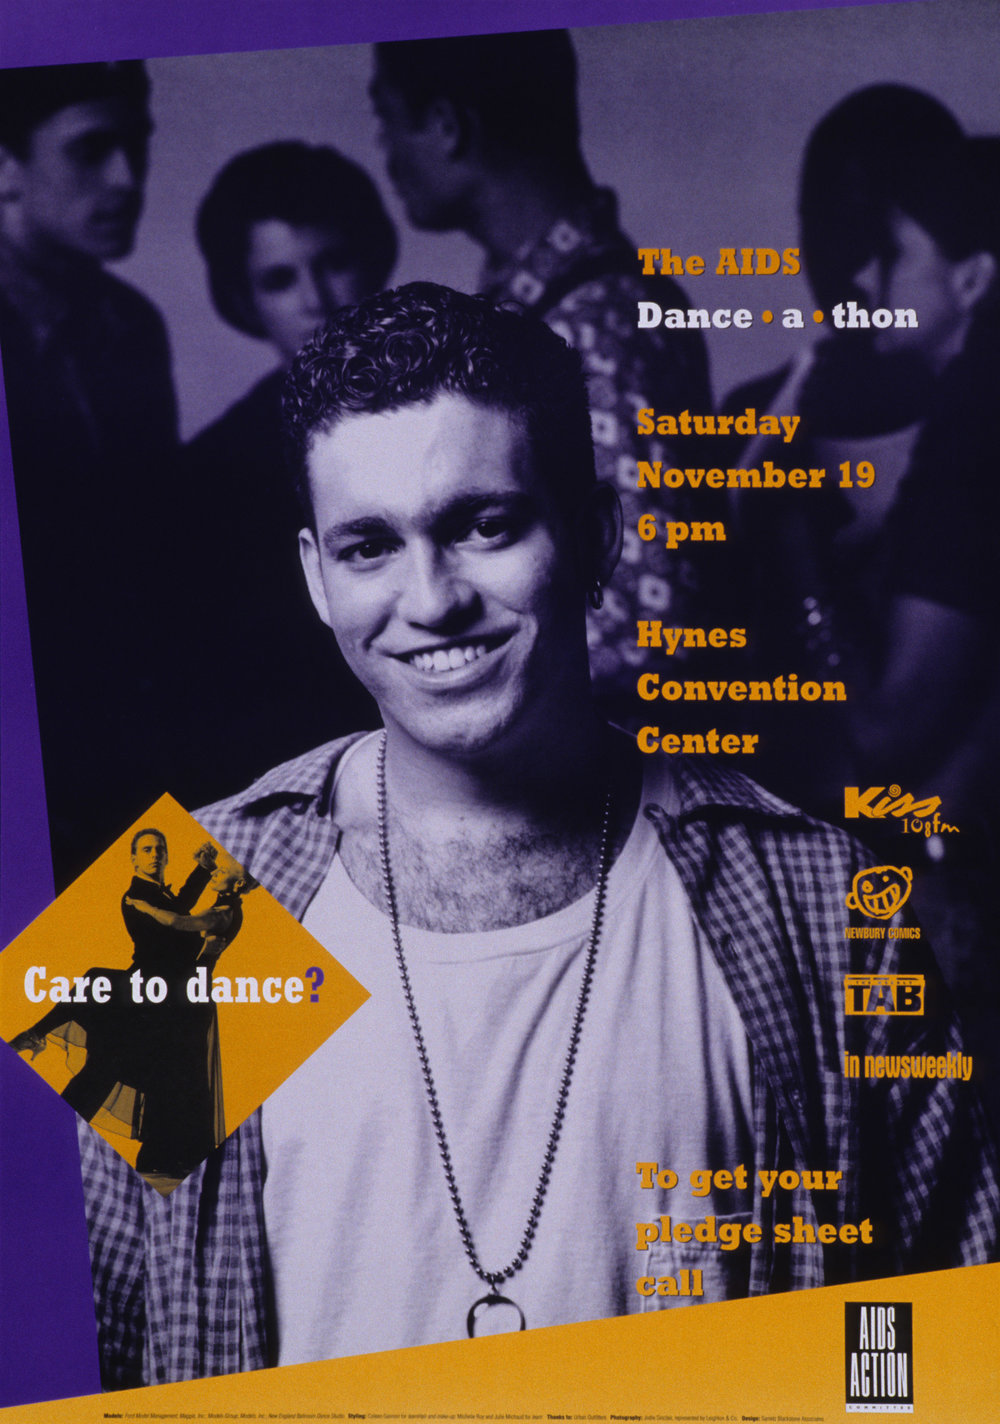 10-1994-AAC-Dance-a-thon-1lrgmed.jpg